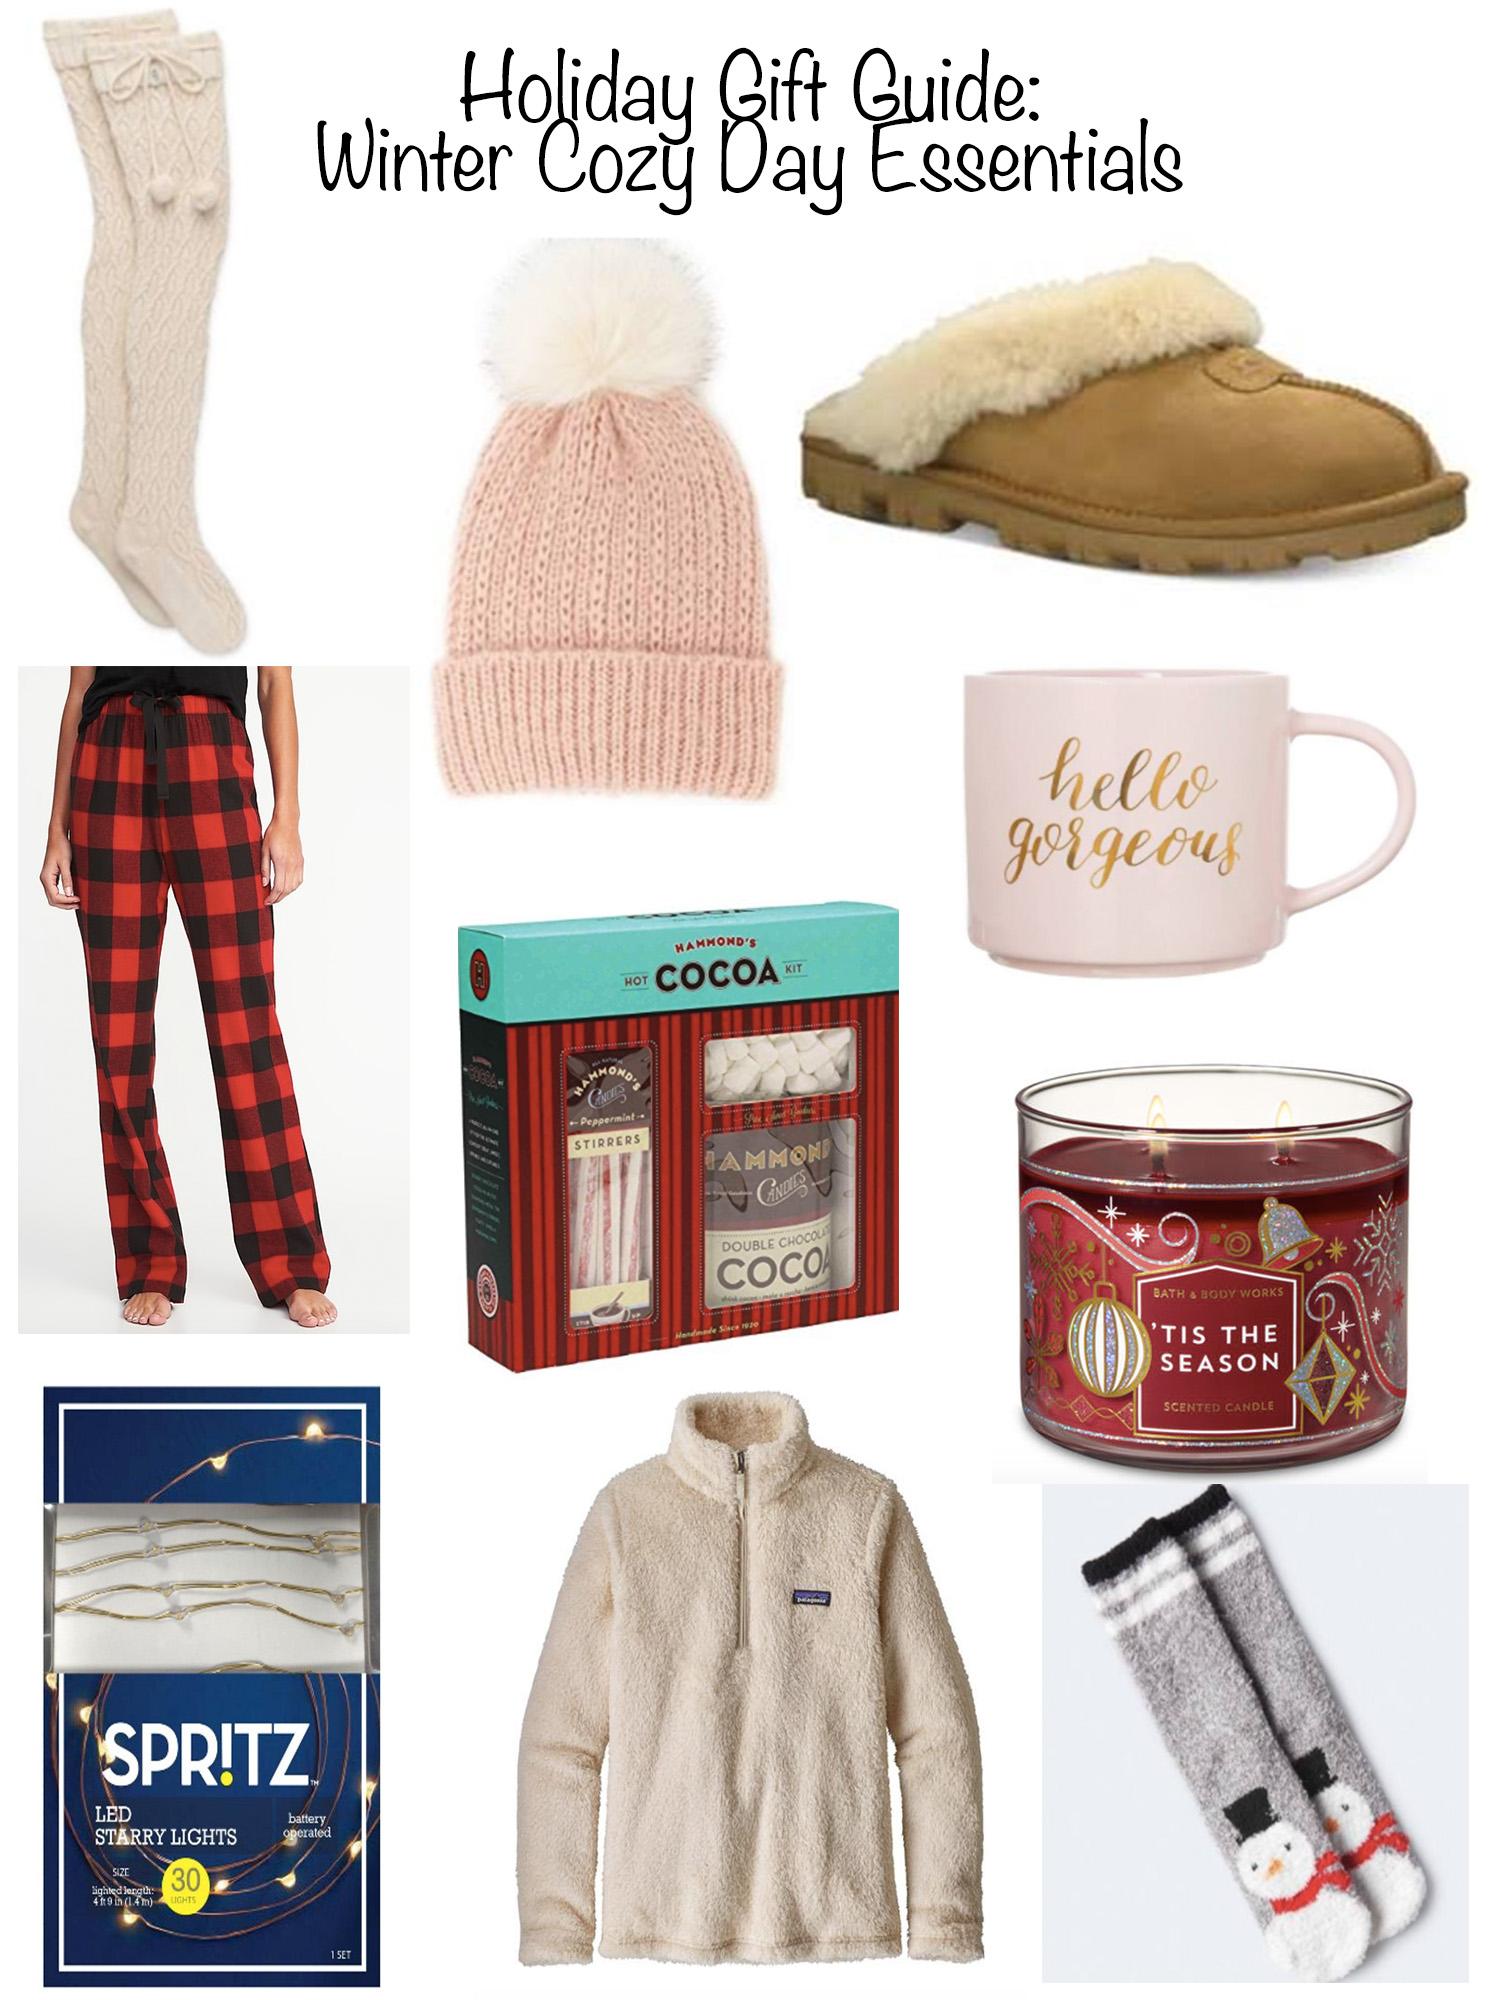 HolidayGiftGuide_WinterCozyEssentials